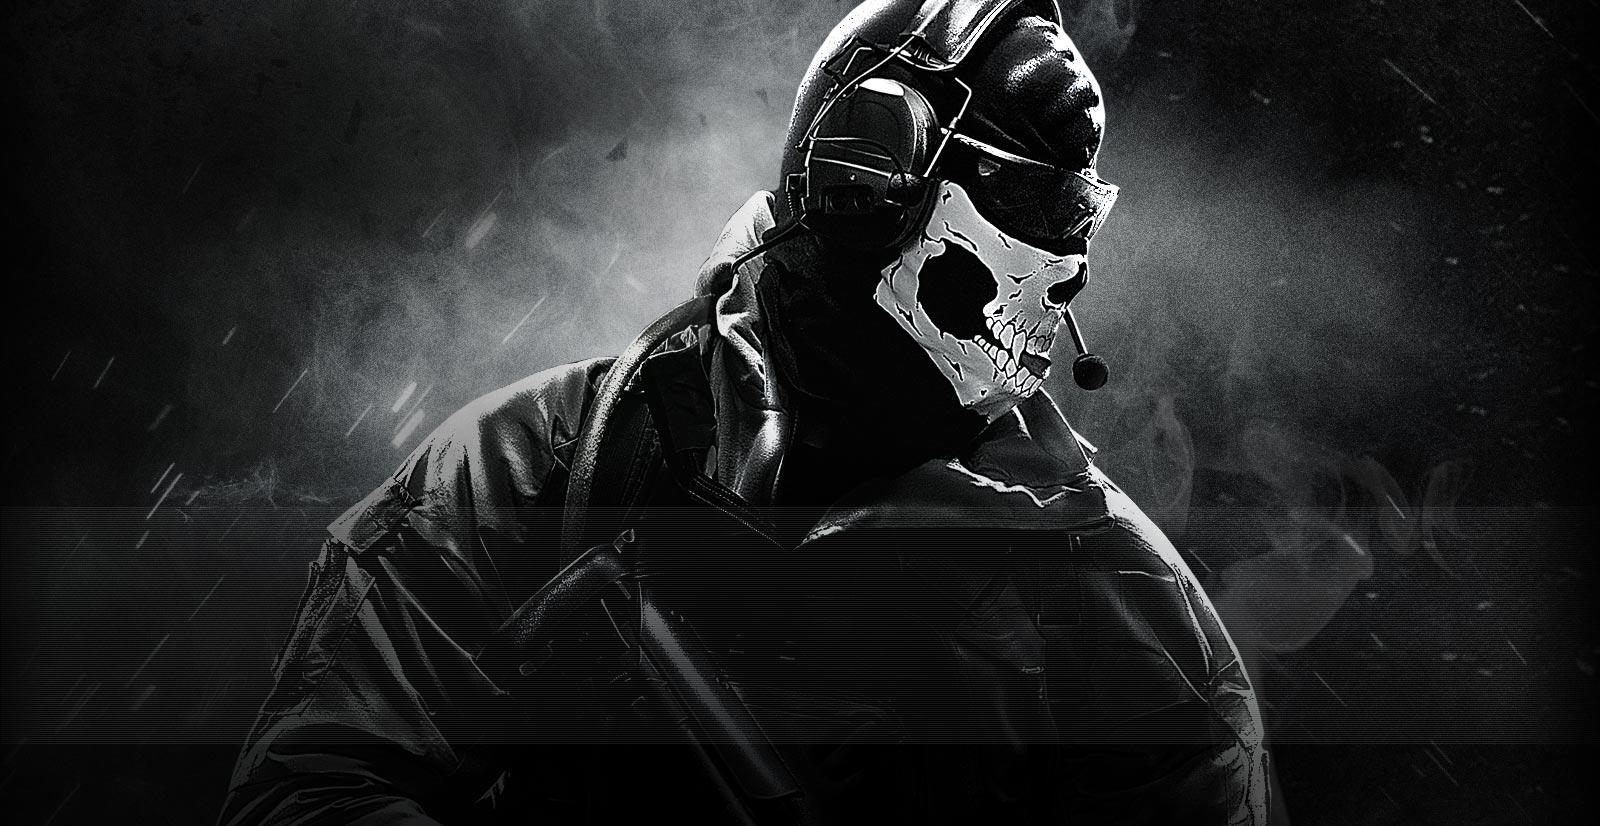 Warfare 2 Wallpaper Ghost 6328 Hd Wallpapers in Games   Imagescicom 1600x826